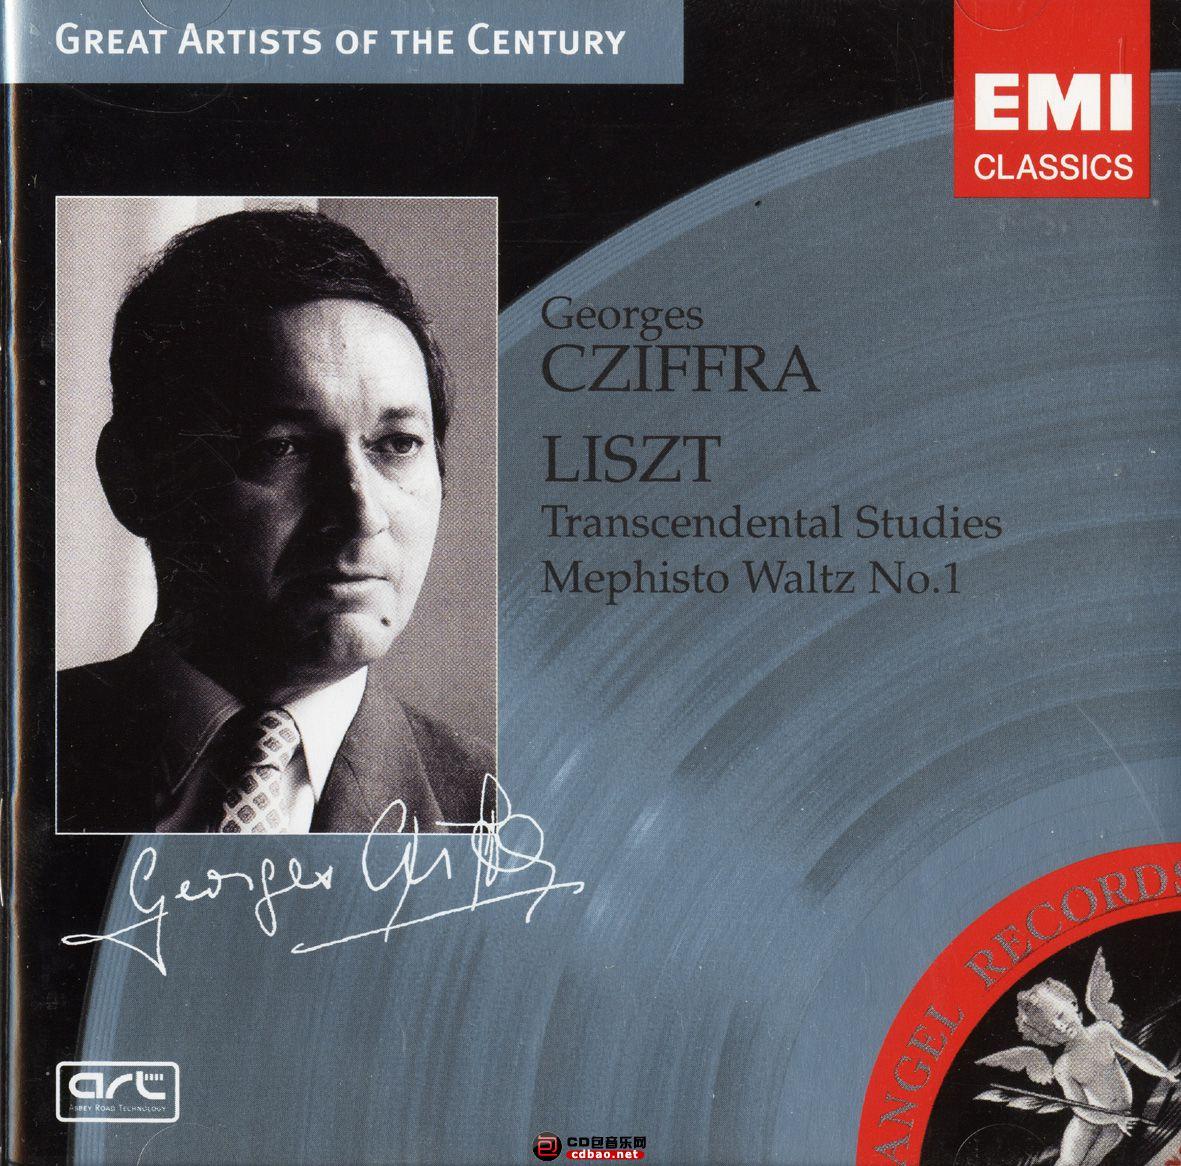 Cziffra_Liszt.Transcendental Studies & Mephisto Waltz No.1.01.jpg